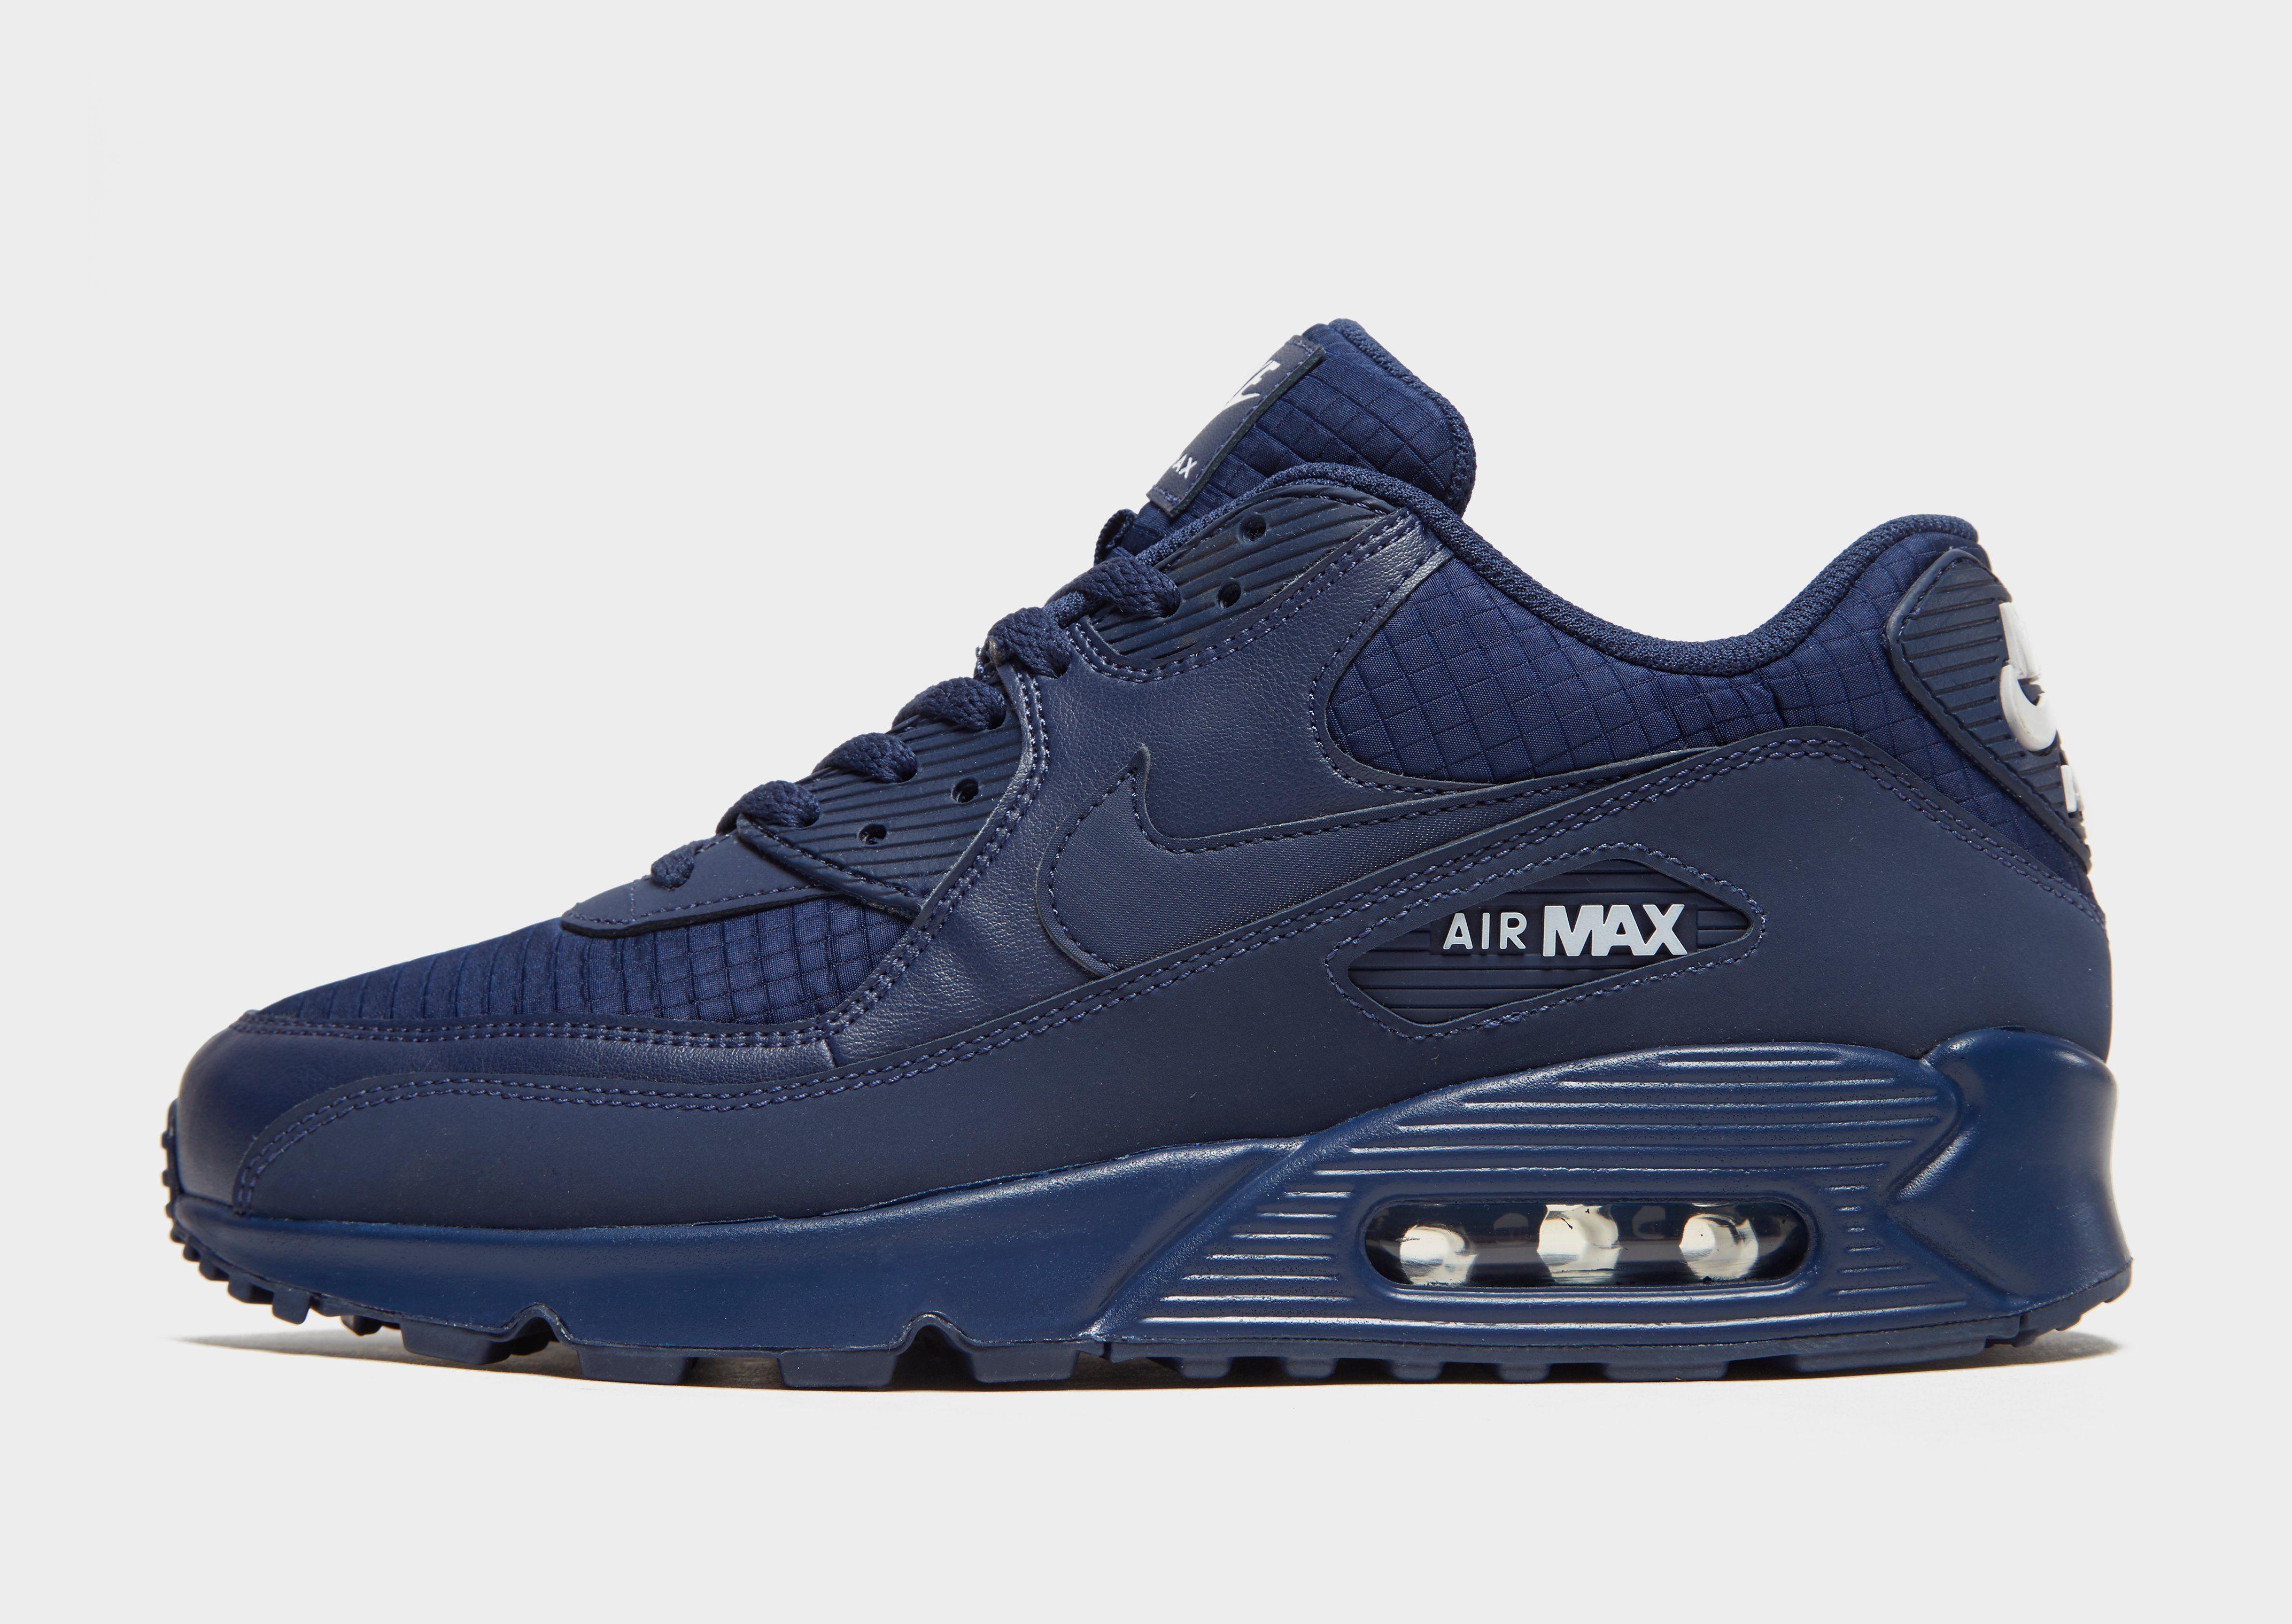 reputable site 59d22 cd9ec Nike Air Max 90 Essential